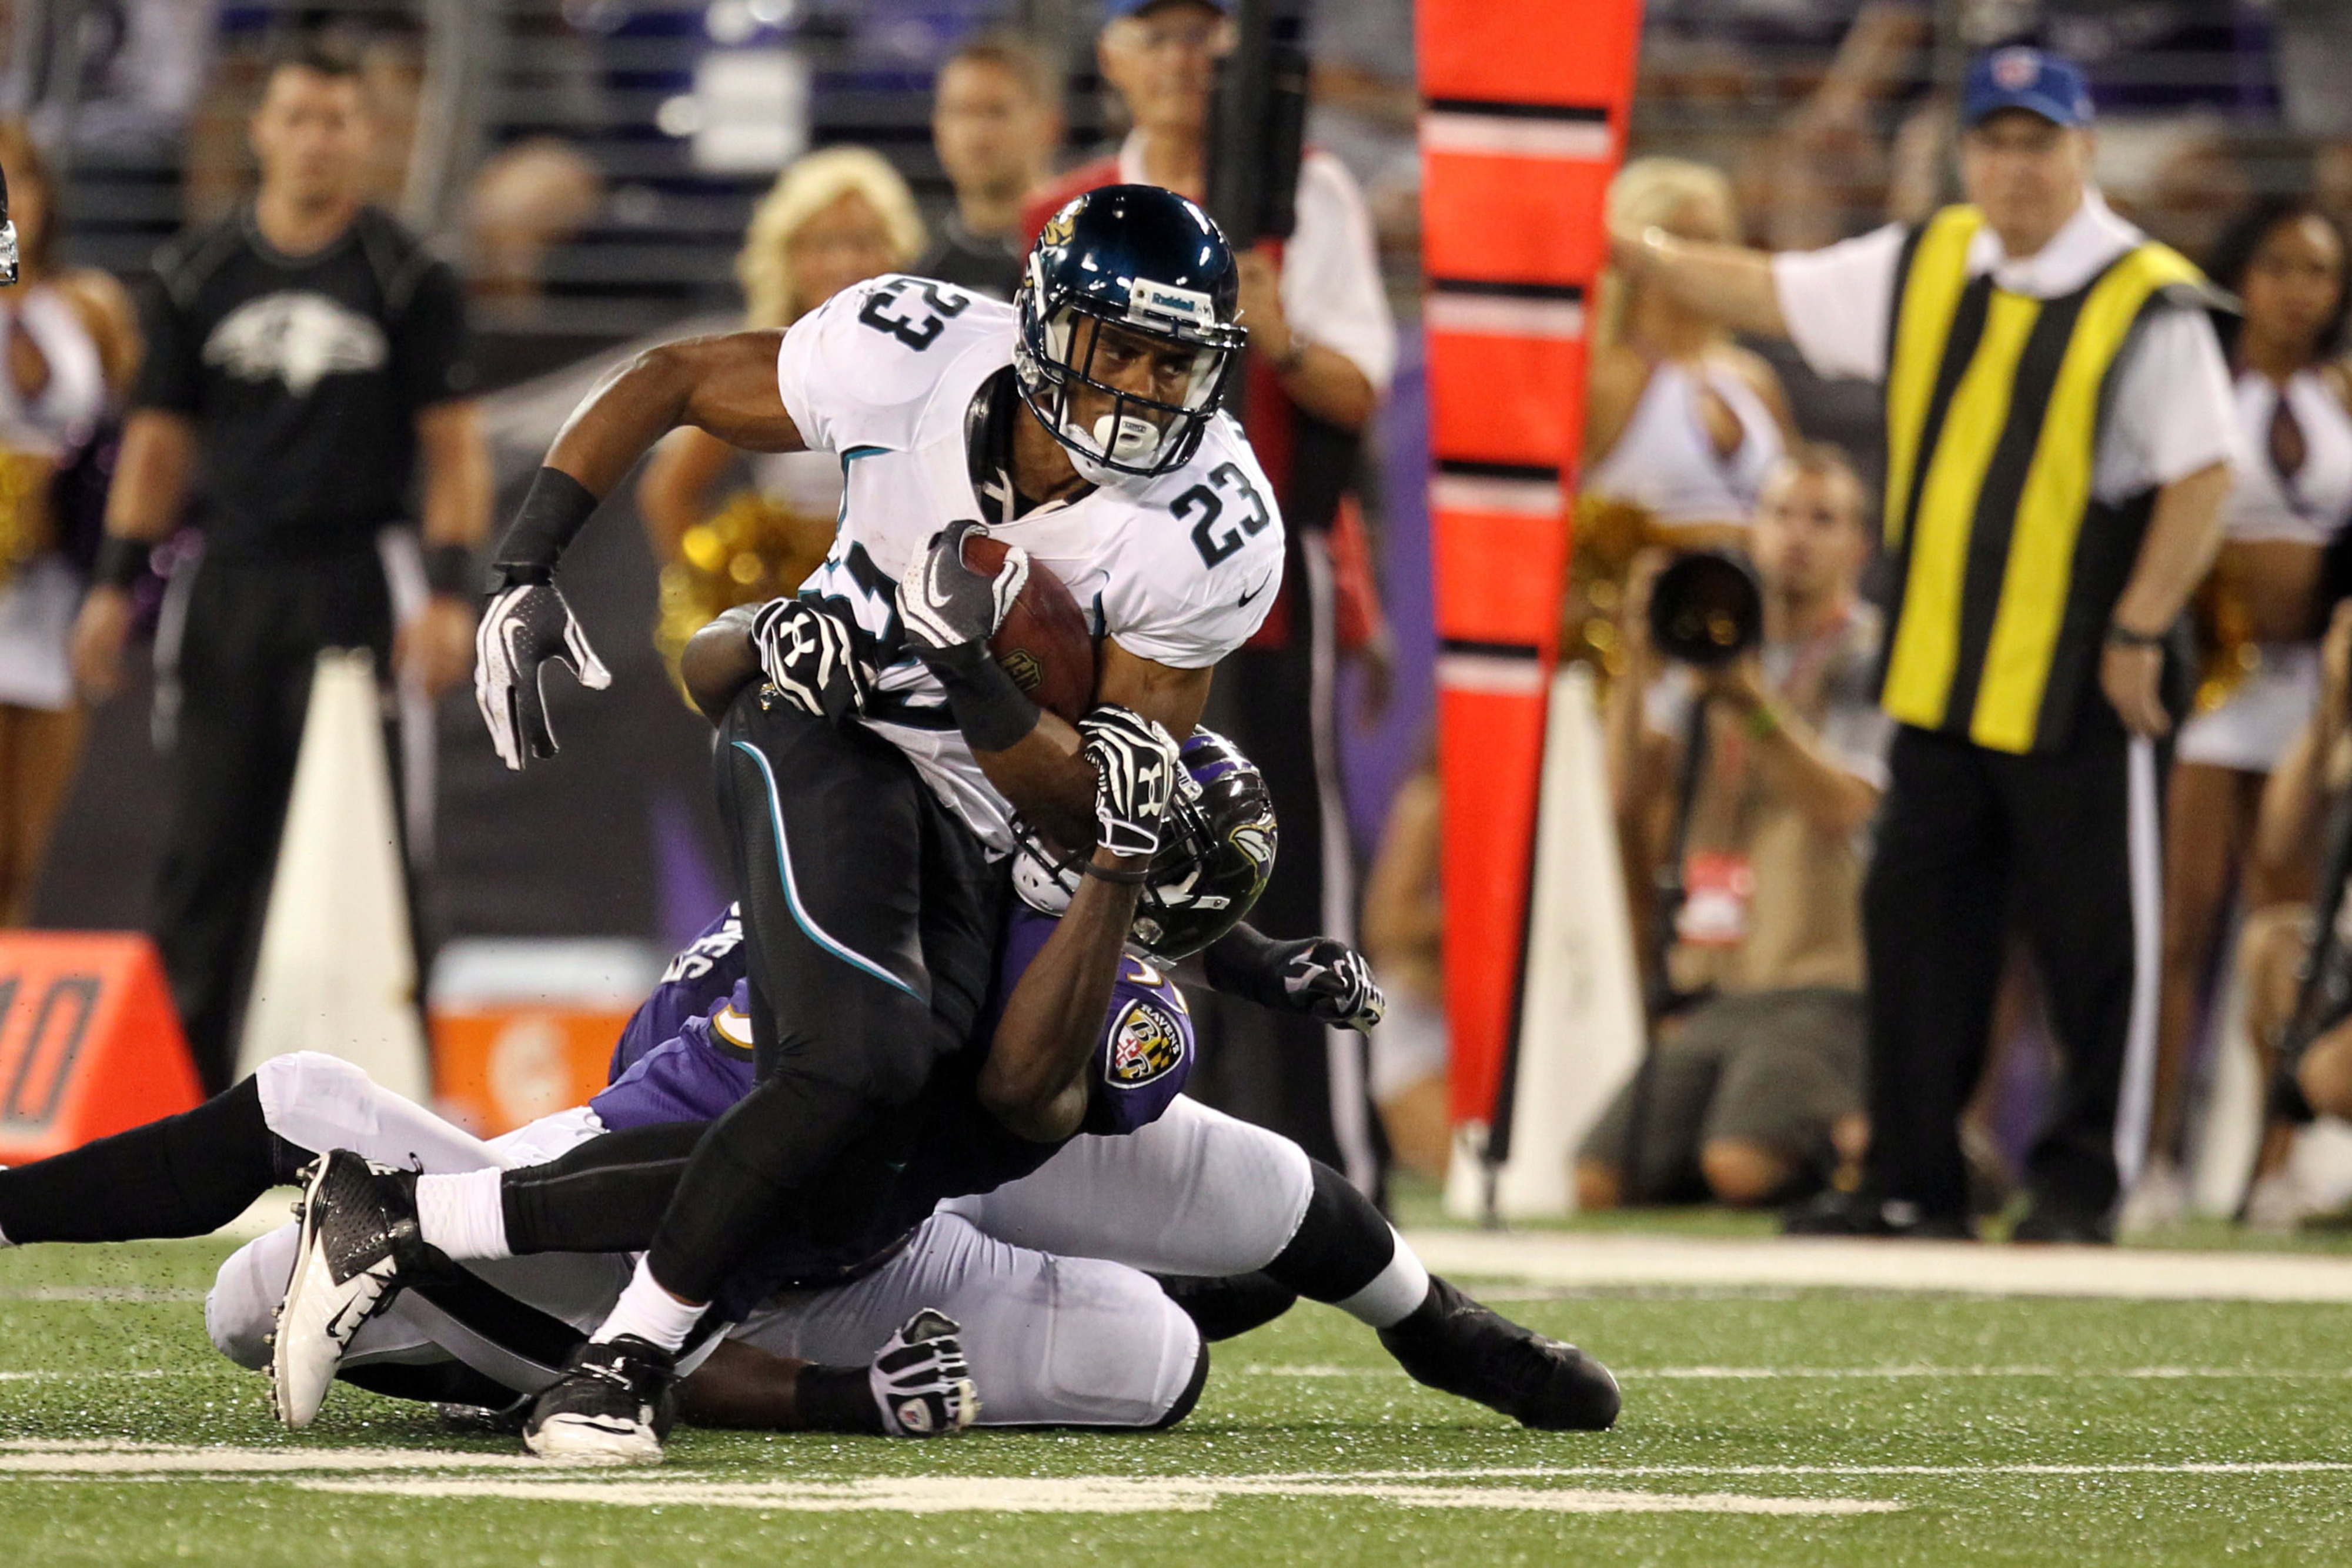 August 23, 2012; Baltimore, MD, USA; Jacksonville Jaguars running back Rashad Jennings (23) runs for a gain against the Baltimore Ravens at M&T Bank Stadium. Mandatory Credit: Mitch Stringer-US PRESSWIRE